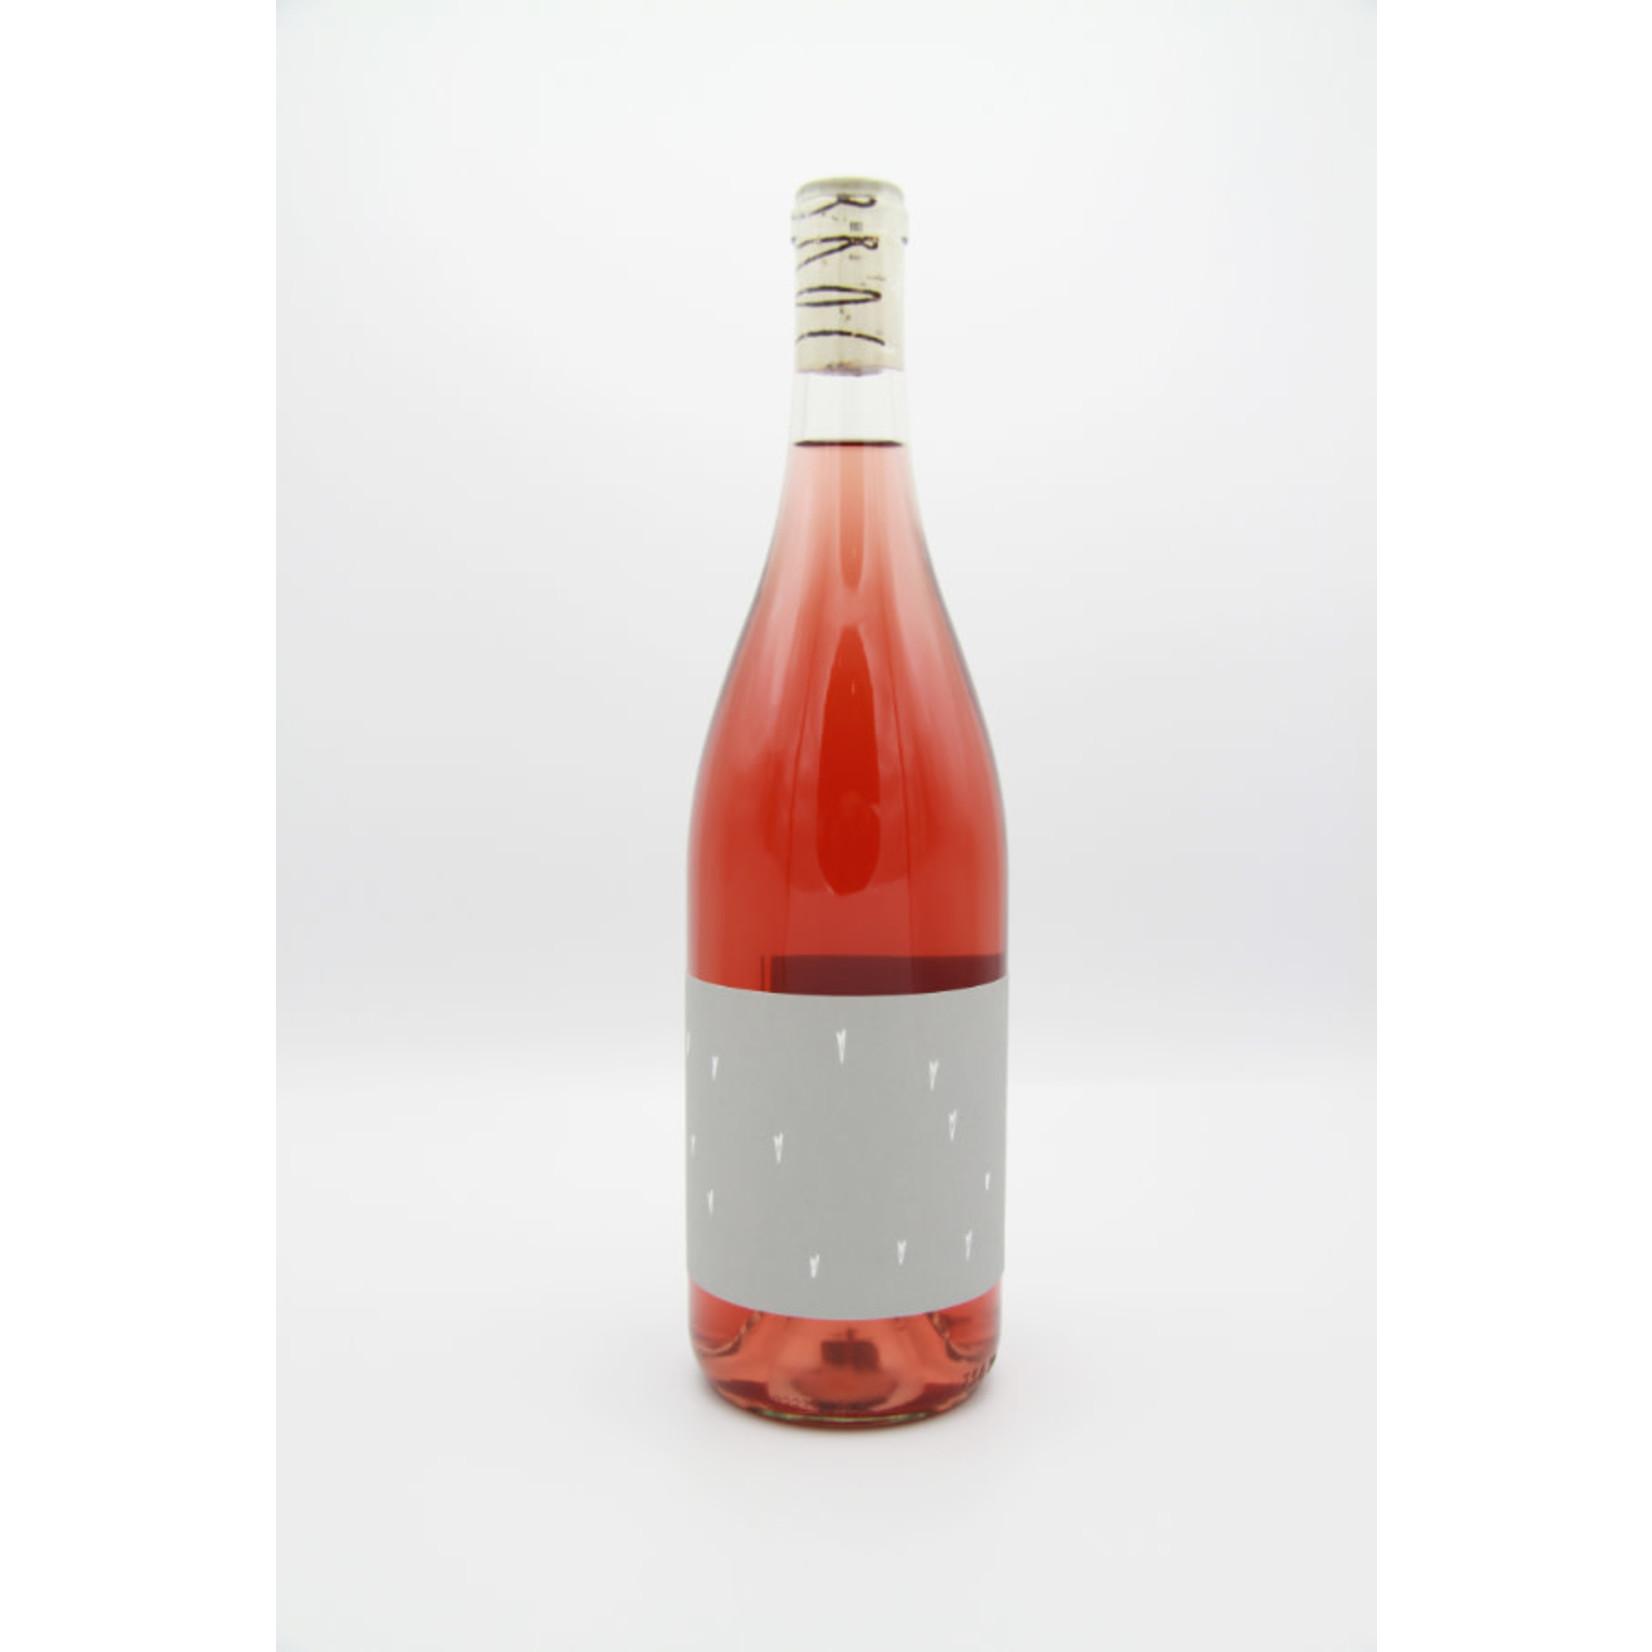 2020 Broc Cellars 'Love' Rosé